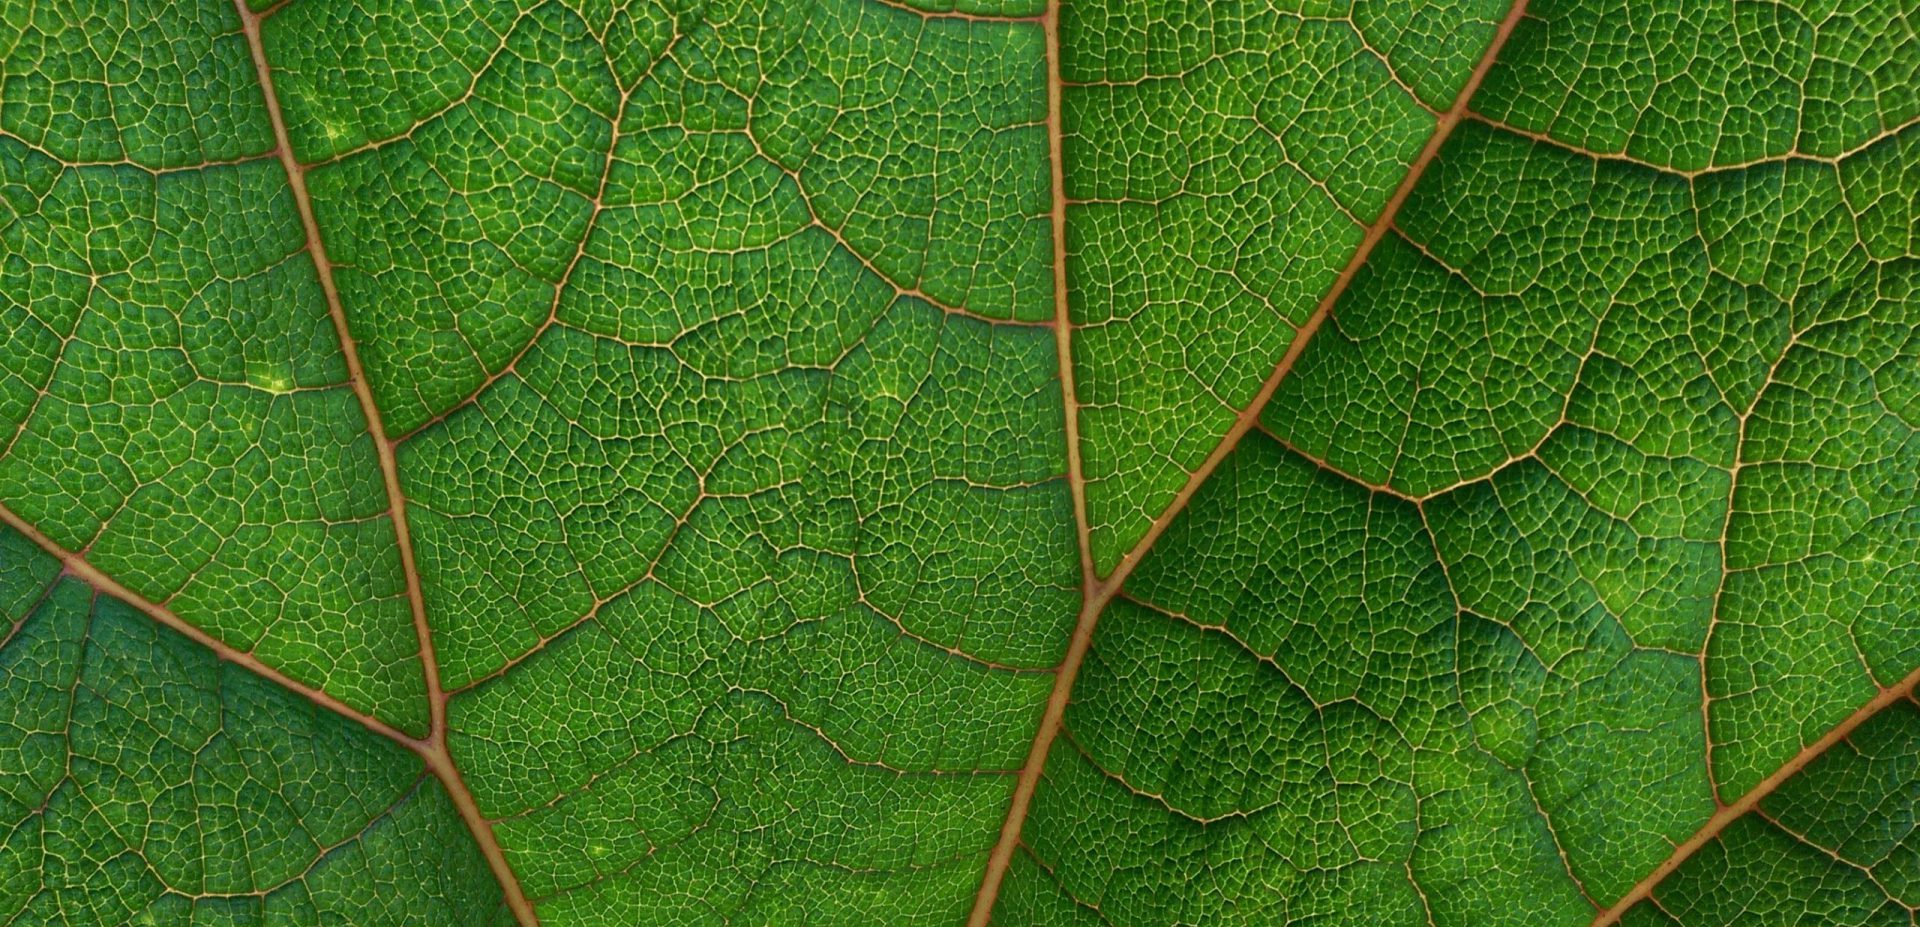 Transicion Verde